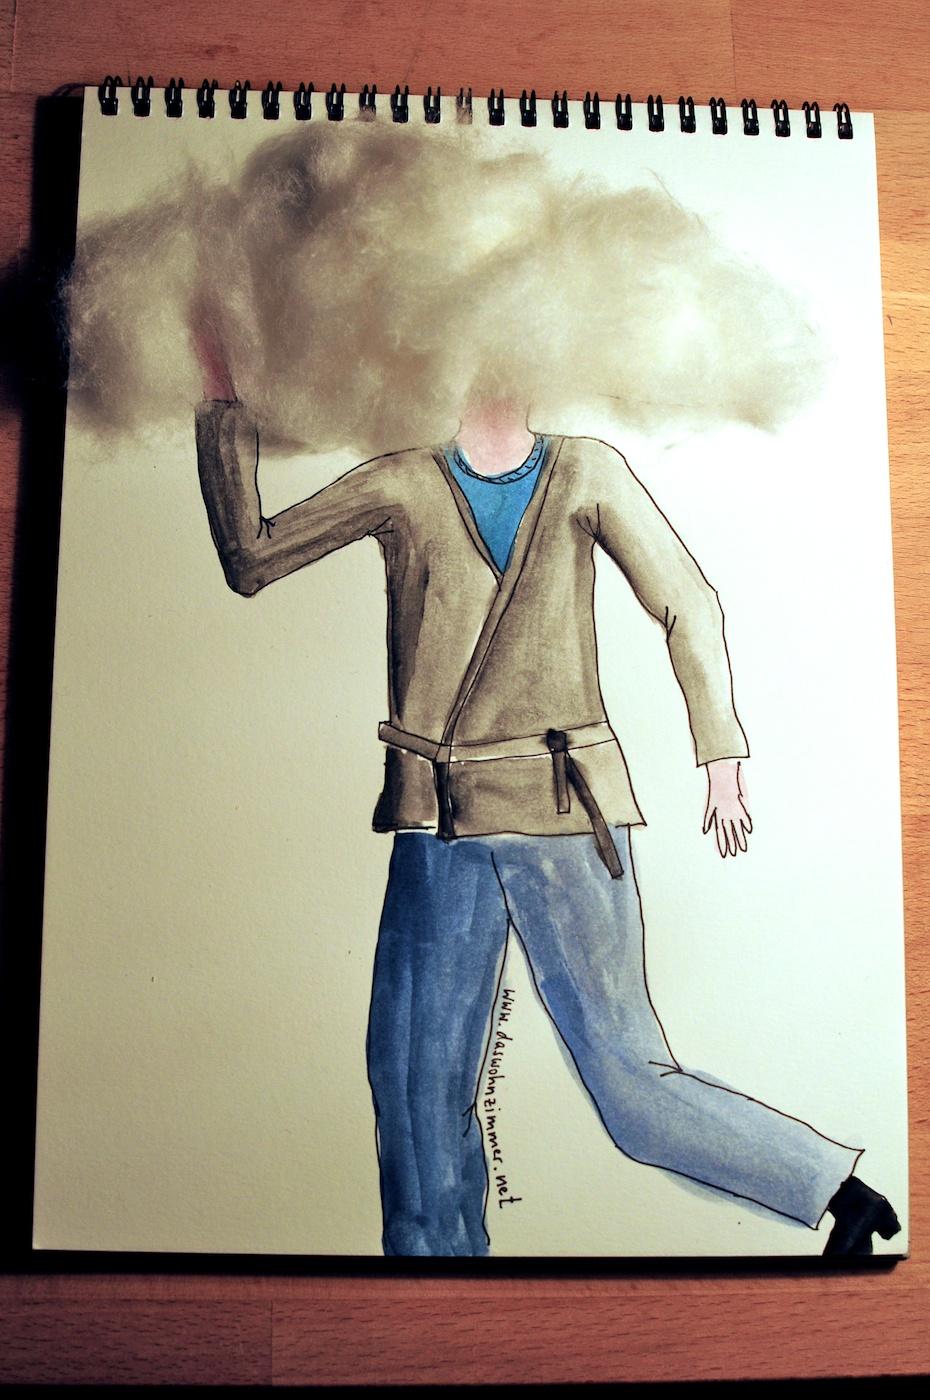 Be Creative #27 - Feeling Cloudy, © Ines Häufler, 2011